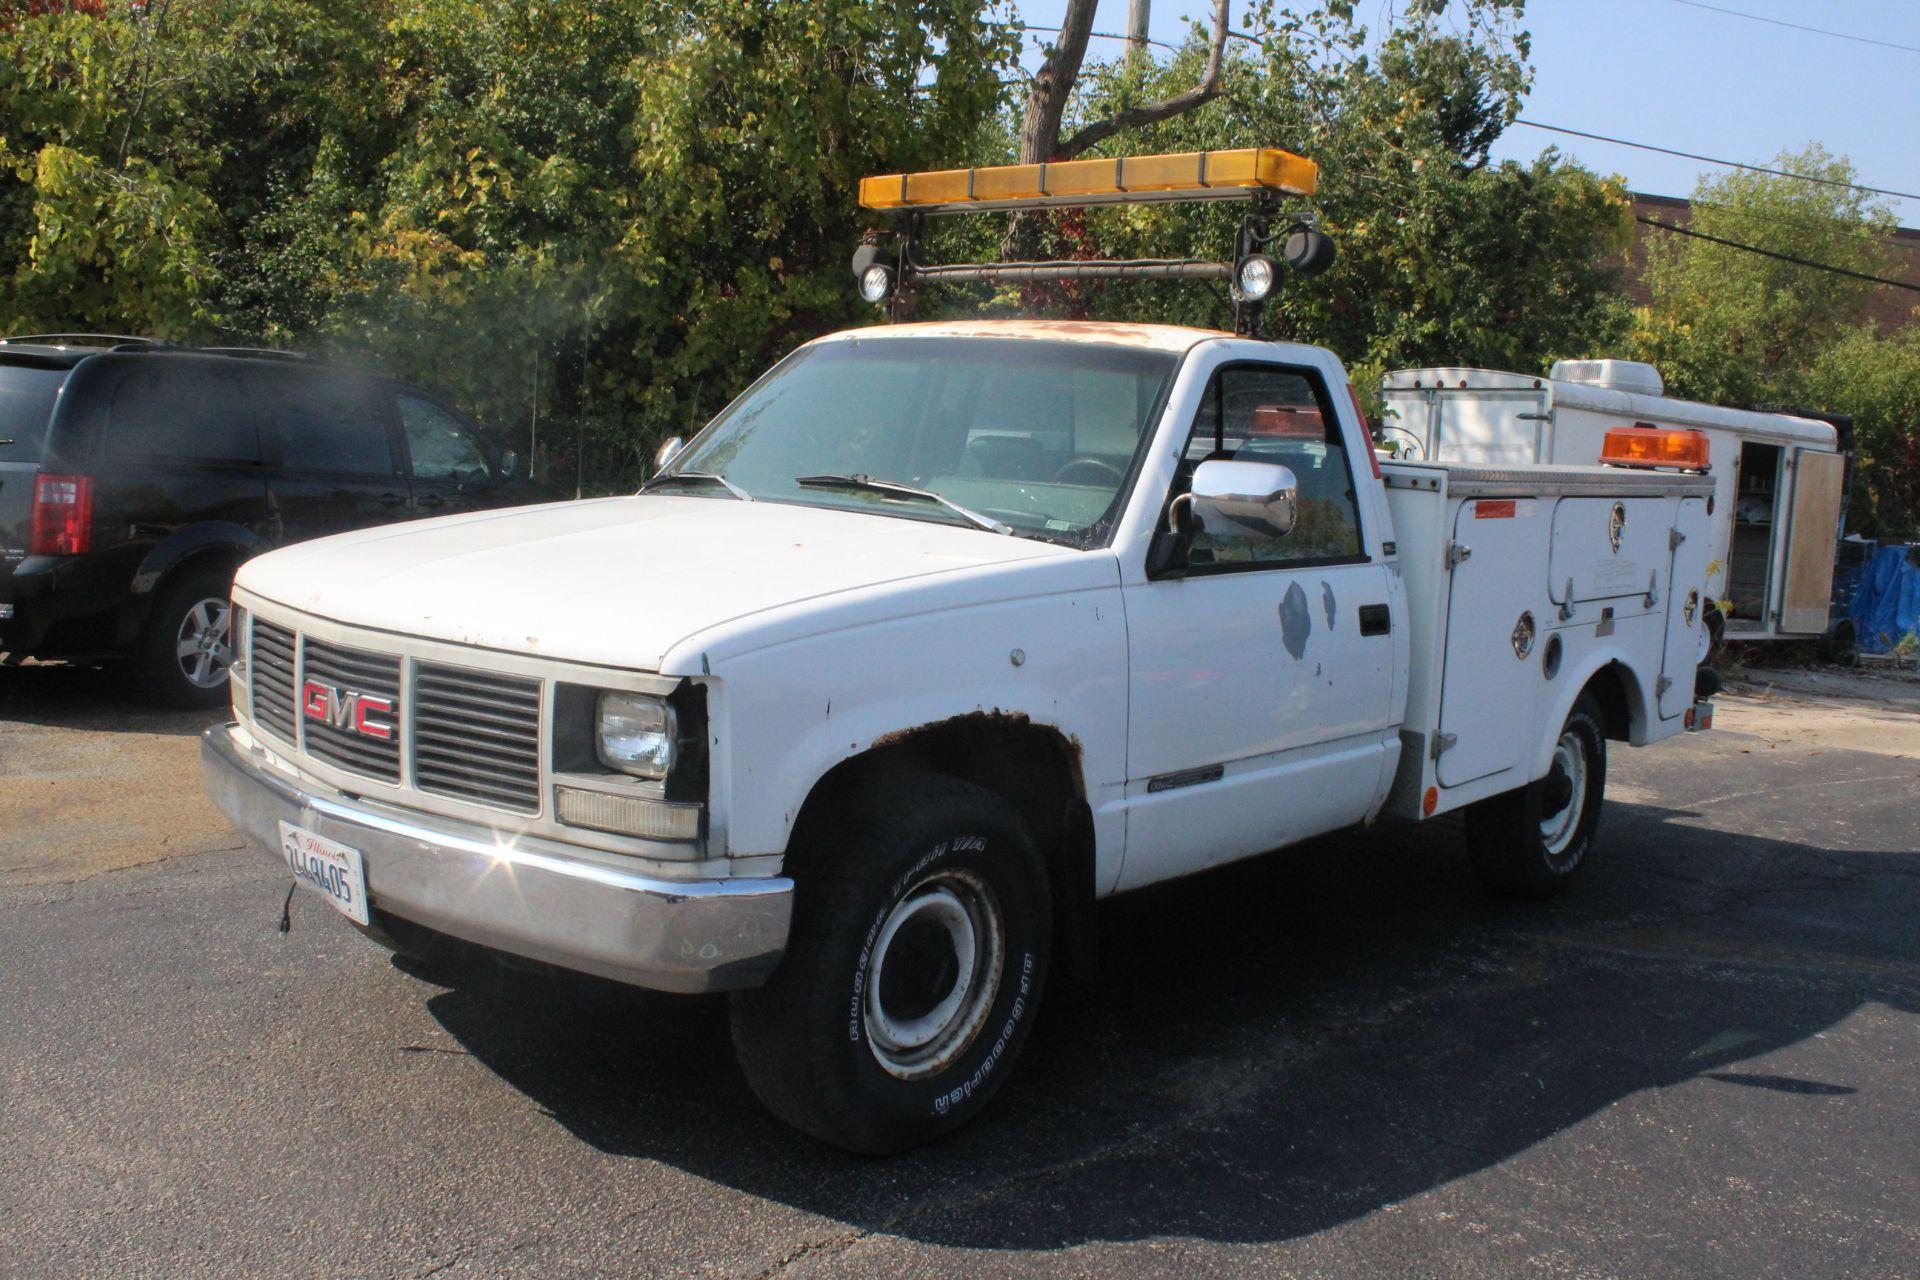 Lot 1 - 1993 GMC SIERRA 2500, 5.7L V-8, AUTO., TOOL BODY, VIN 1GDGC24K7PE554755, 202,136 MILES SHOWN ON